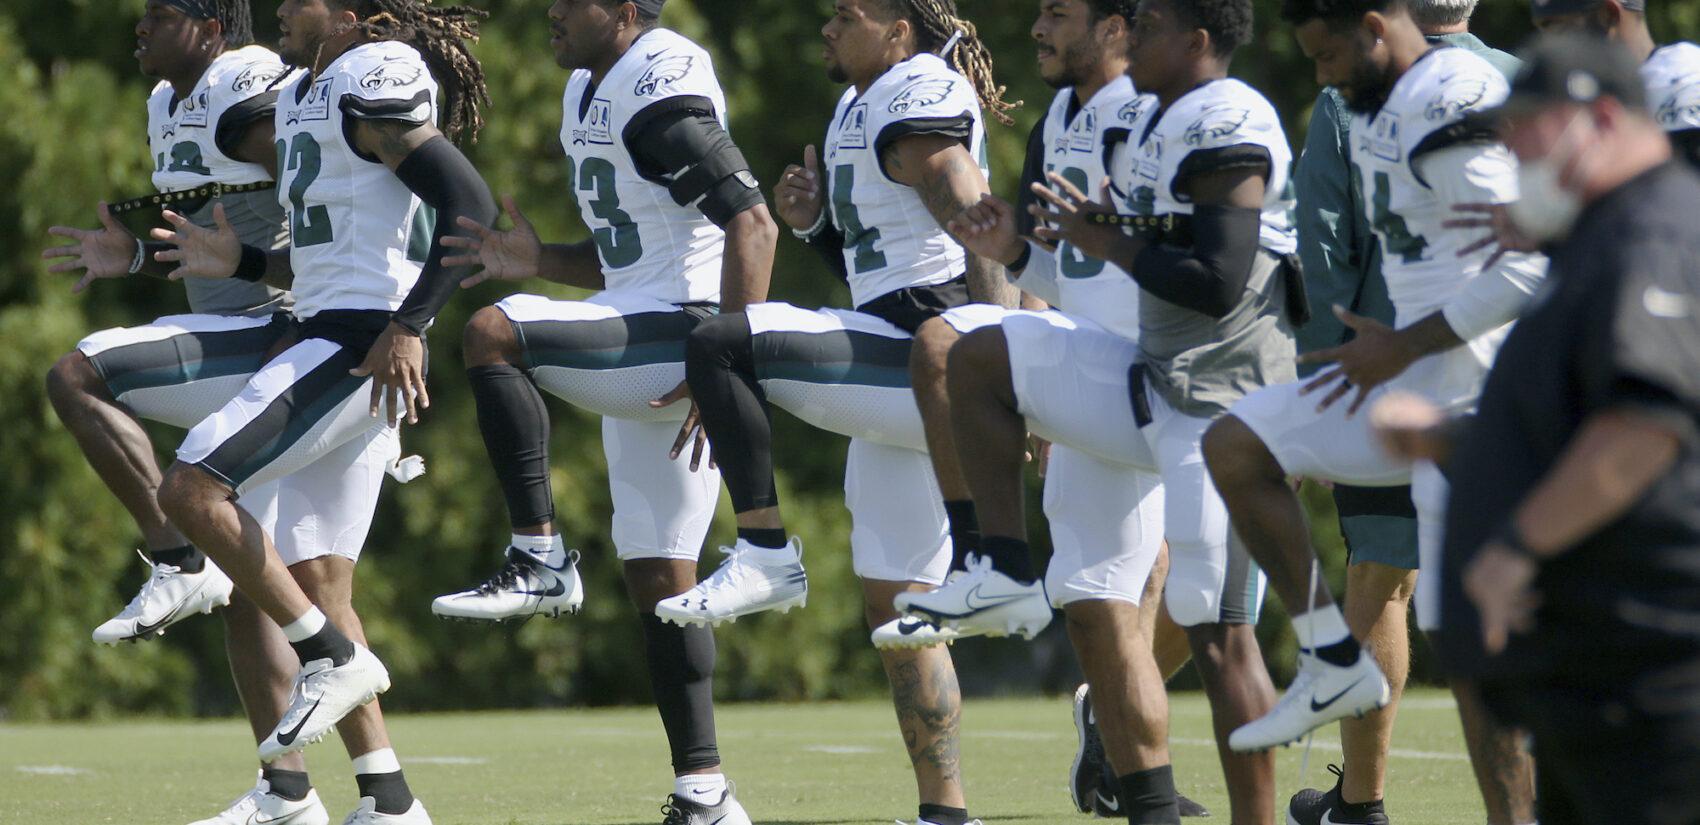 Philadelphia Eagles defenders warm up during NFL training camp